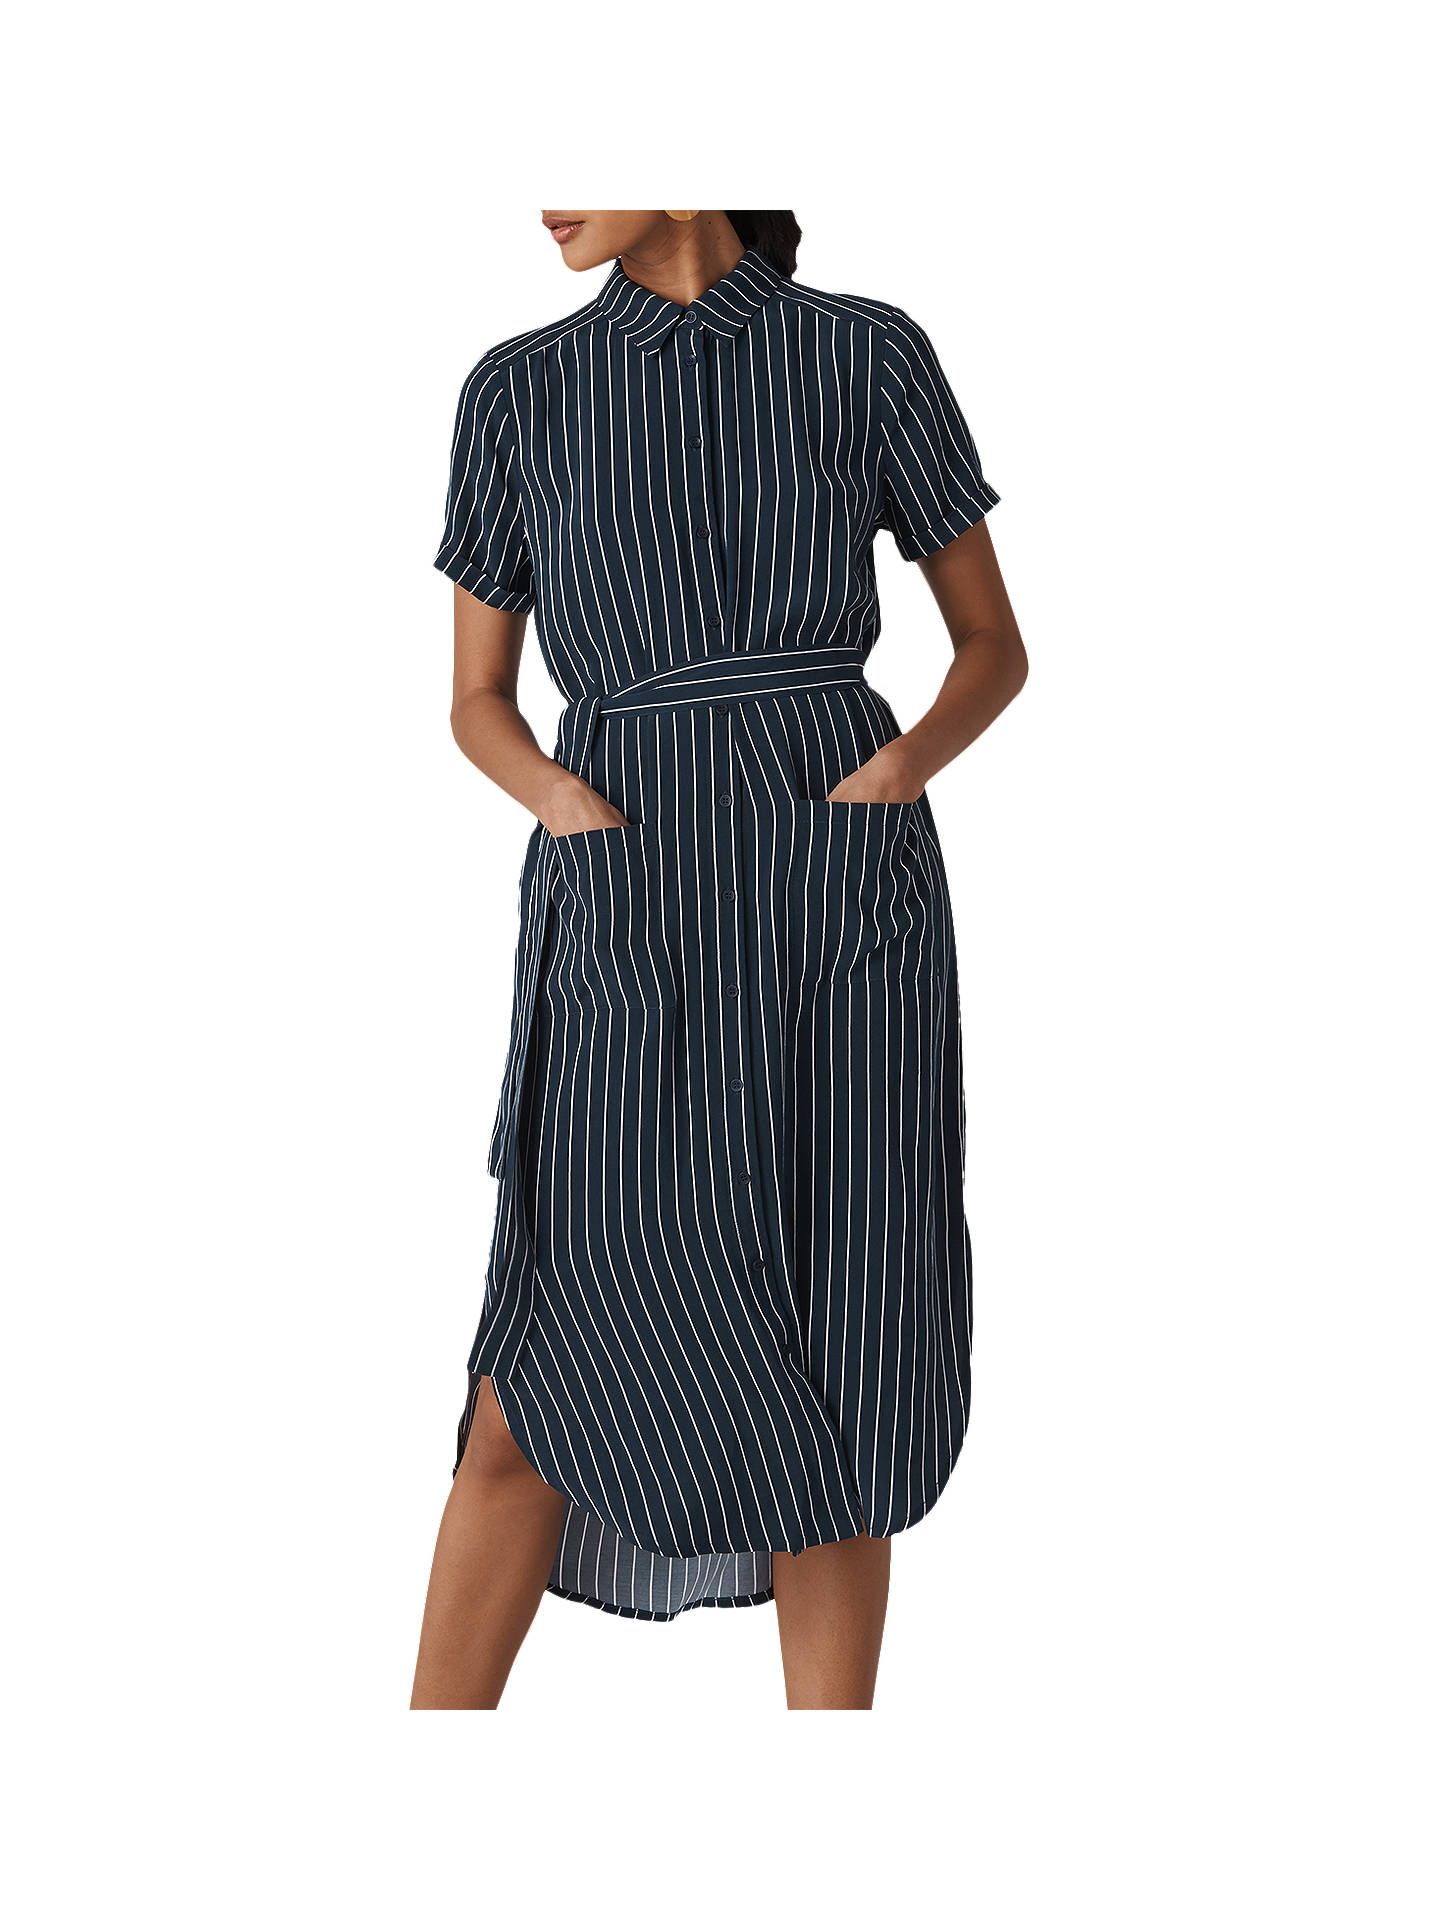 baa2ad85ff5 Buy Whistles Montana Stripe Shirt Dress